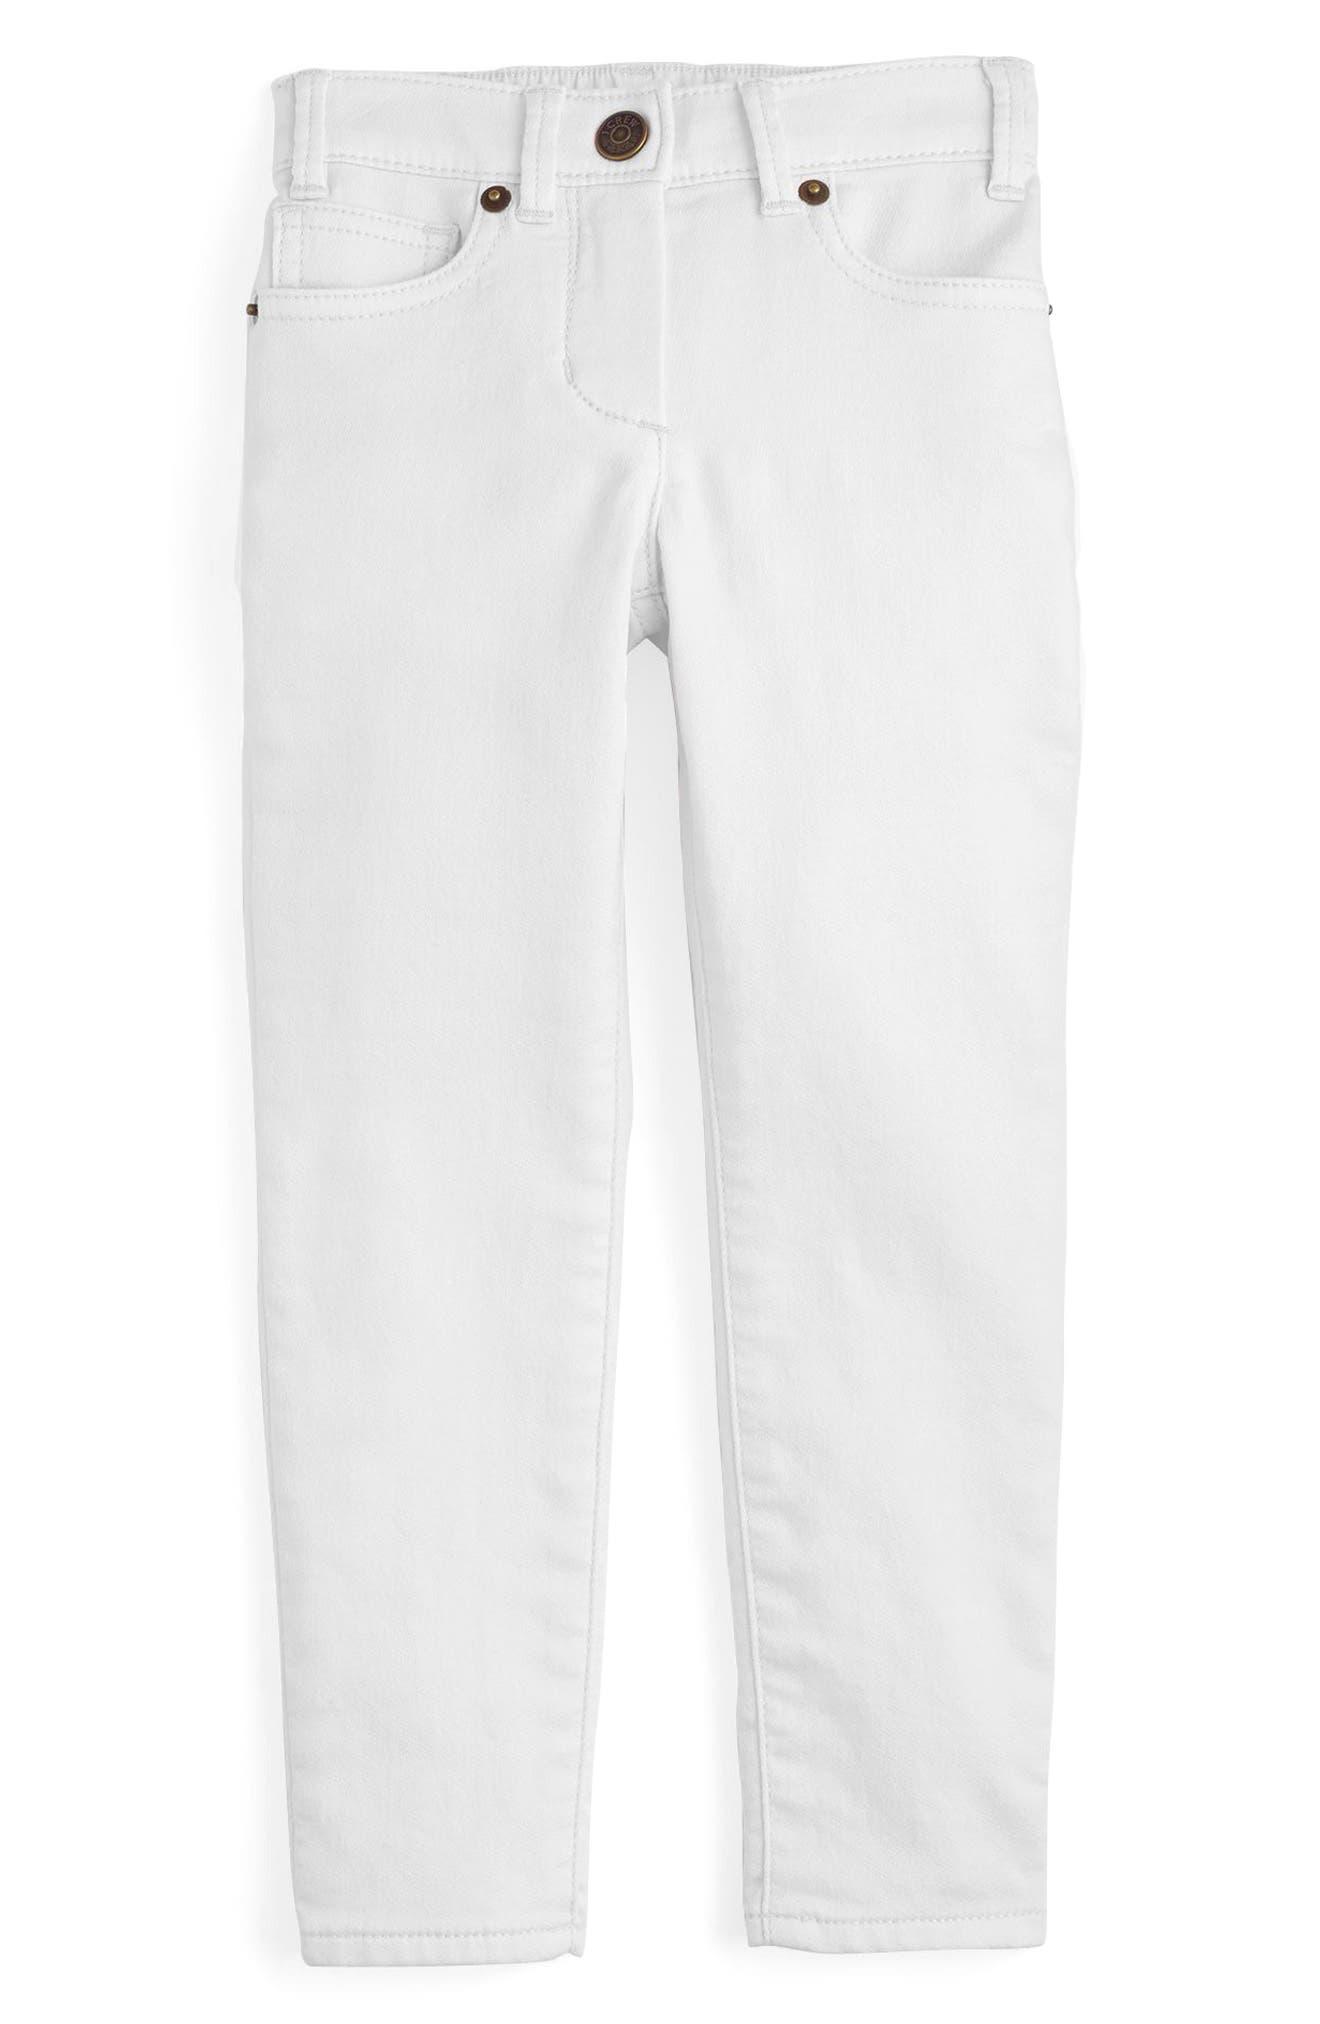 CREWCUTS BY J.CREW,                             Runaround Garment Dye Jeans,                             Main thumbnail 1, color,                             101